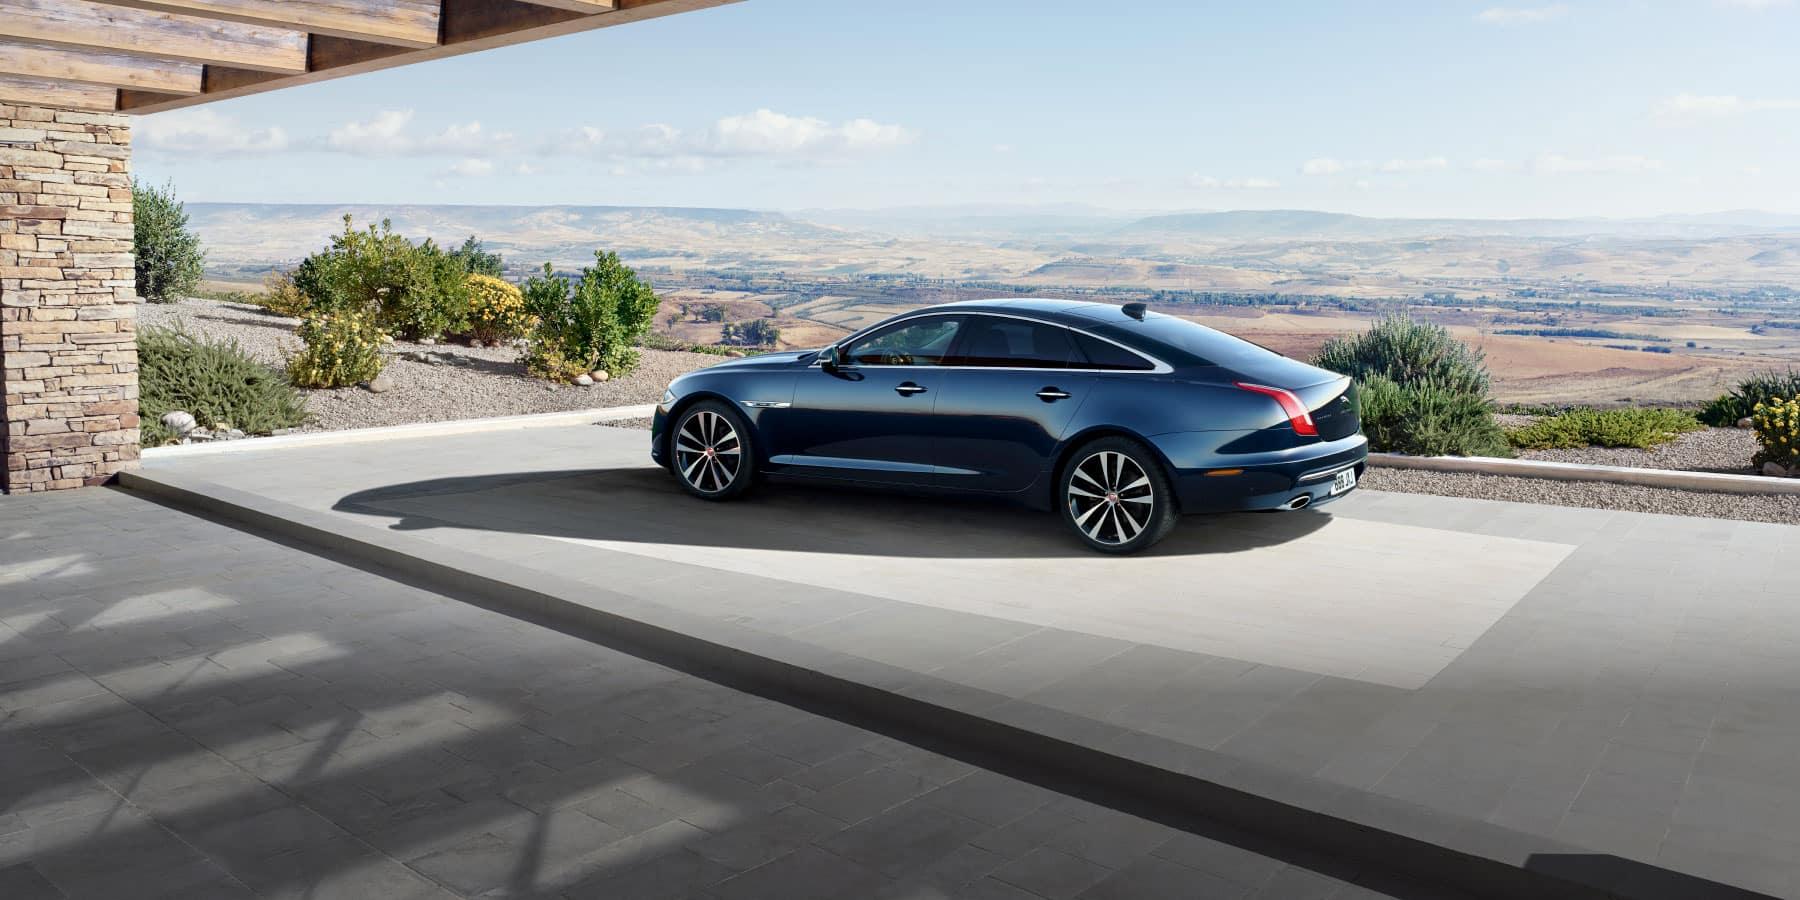 Autobahn Jaguar Fort Worth | Hope You're Having a Great Summer!